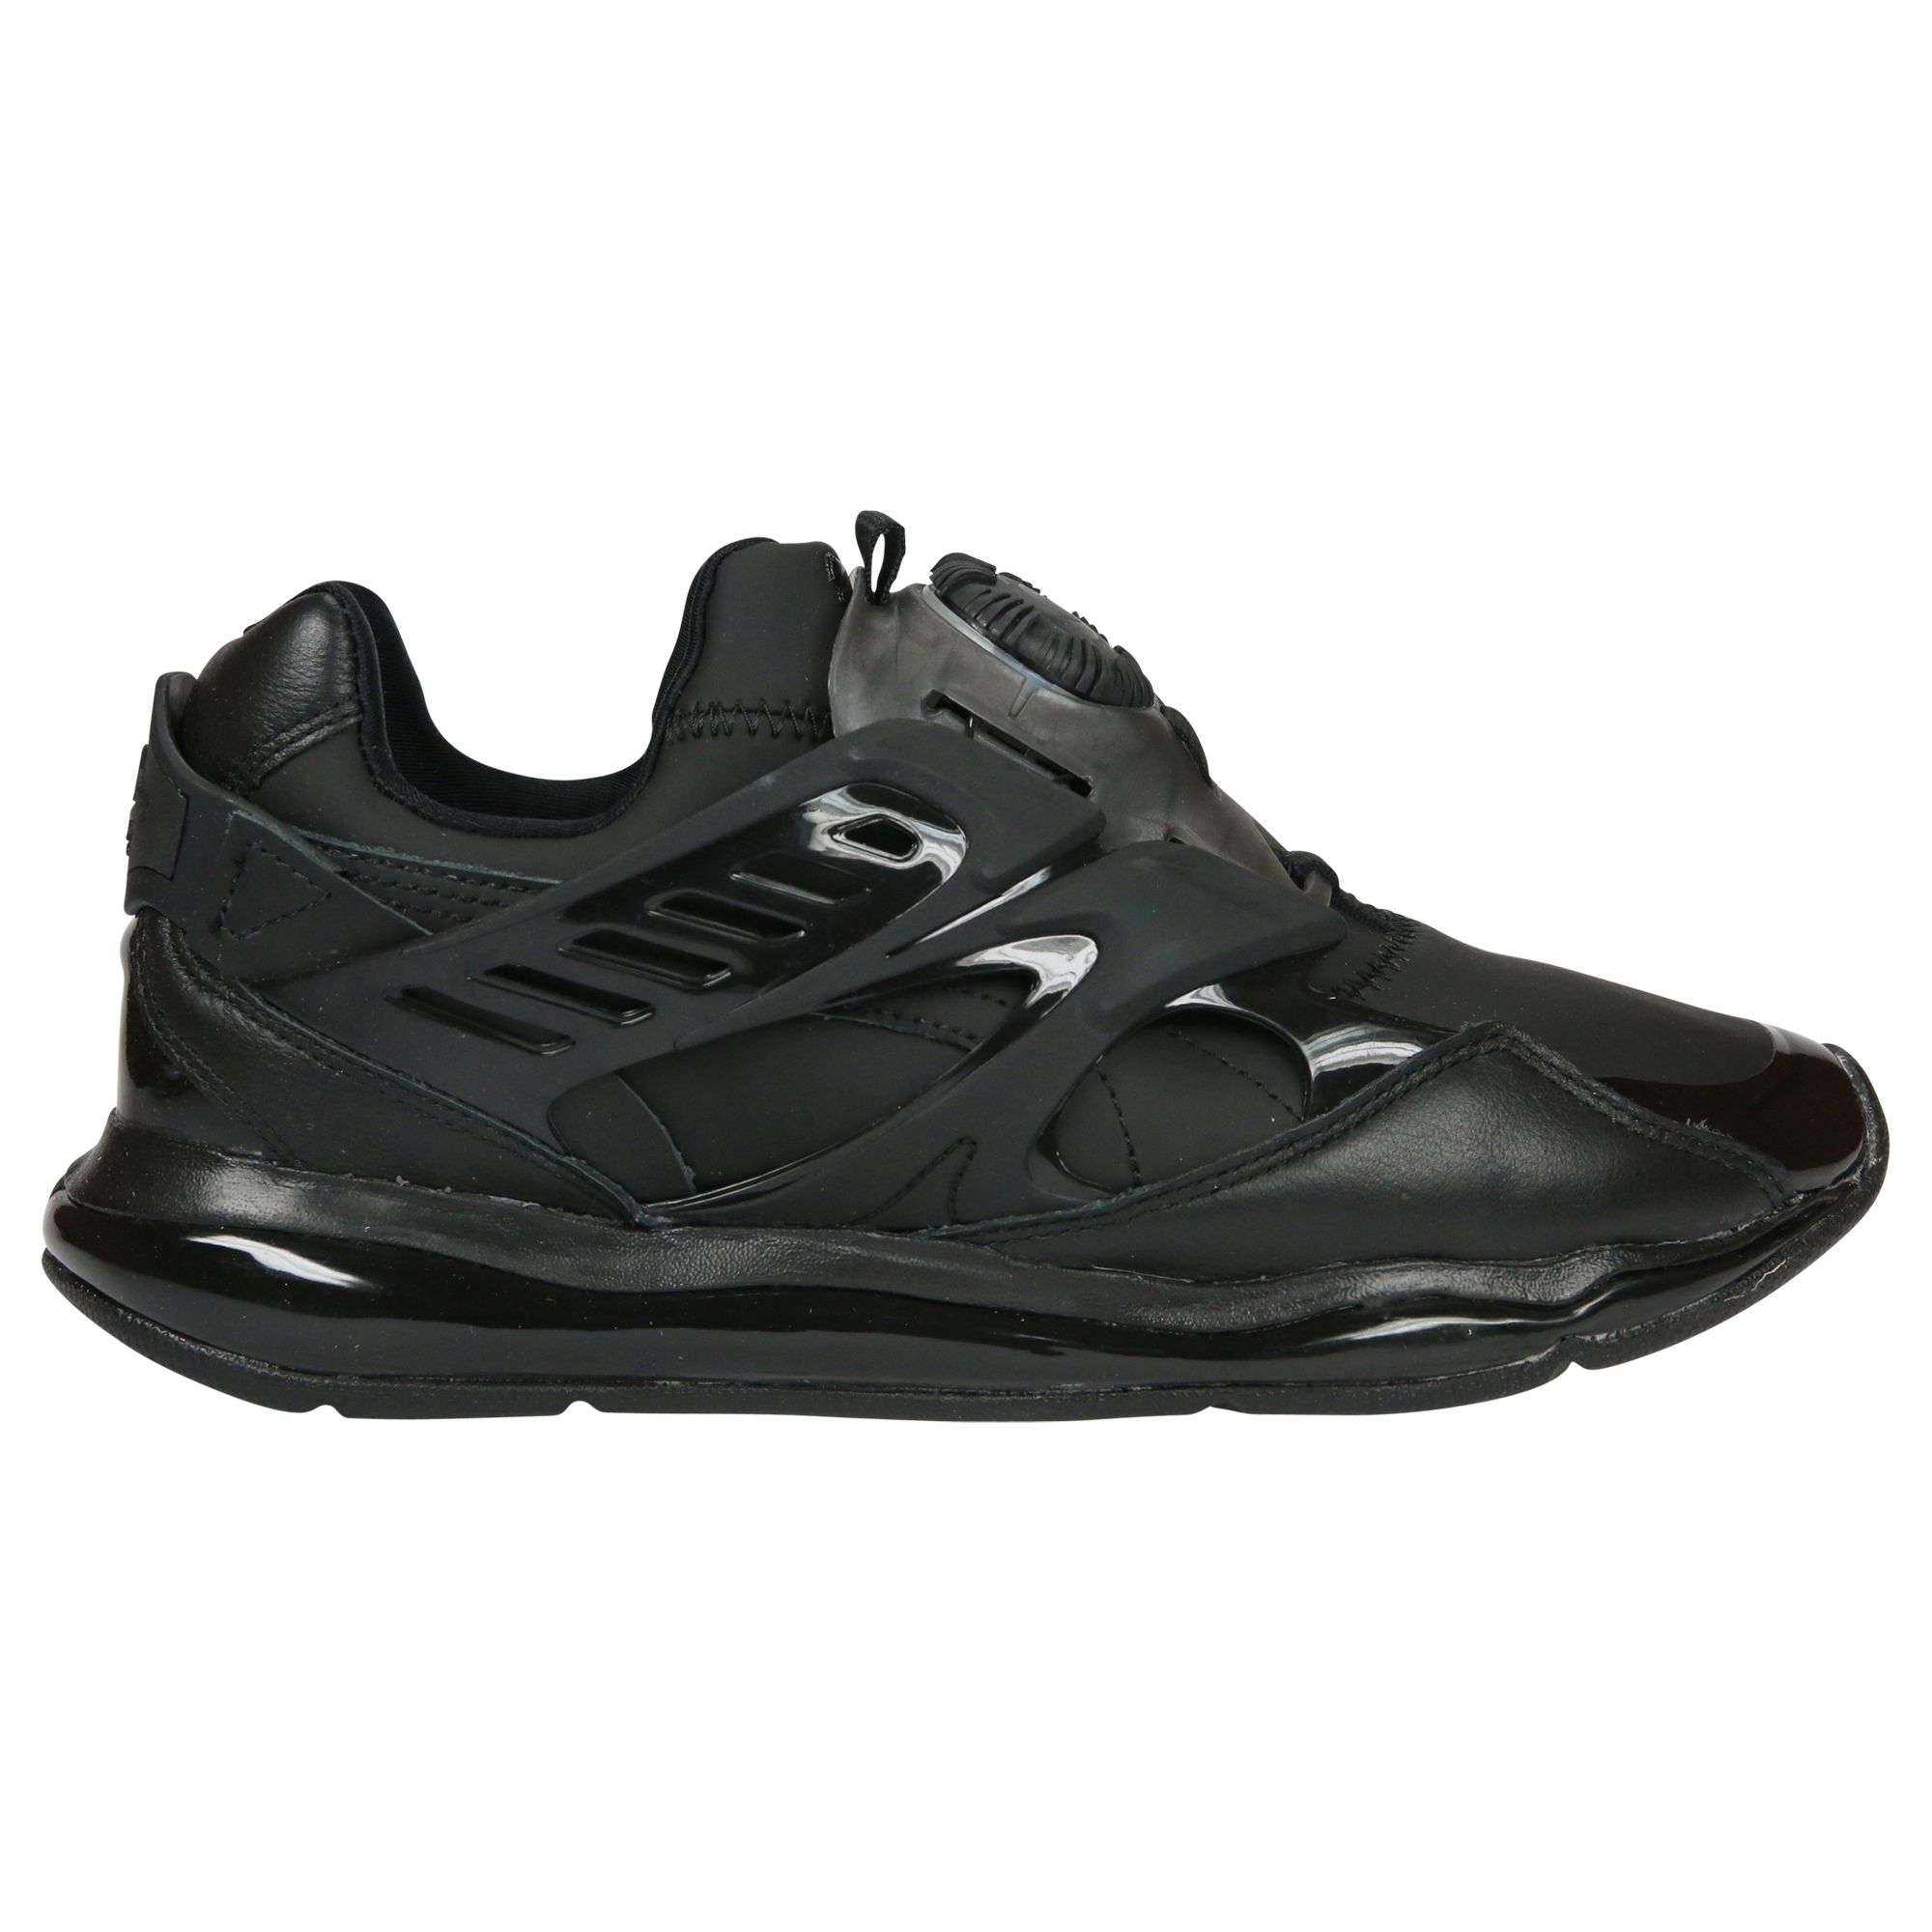 Puma Disc Blaze Cell Schuhe Turnschuhe Sneaker Herren Damen 360078 01 Schwarz